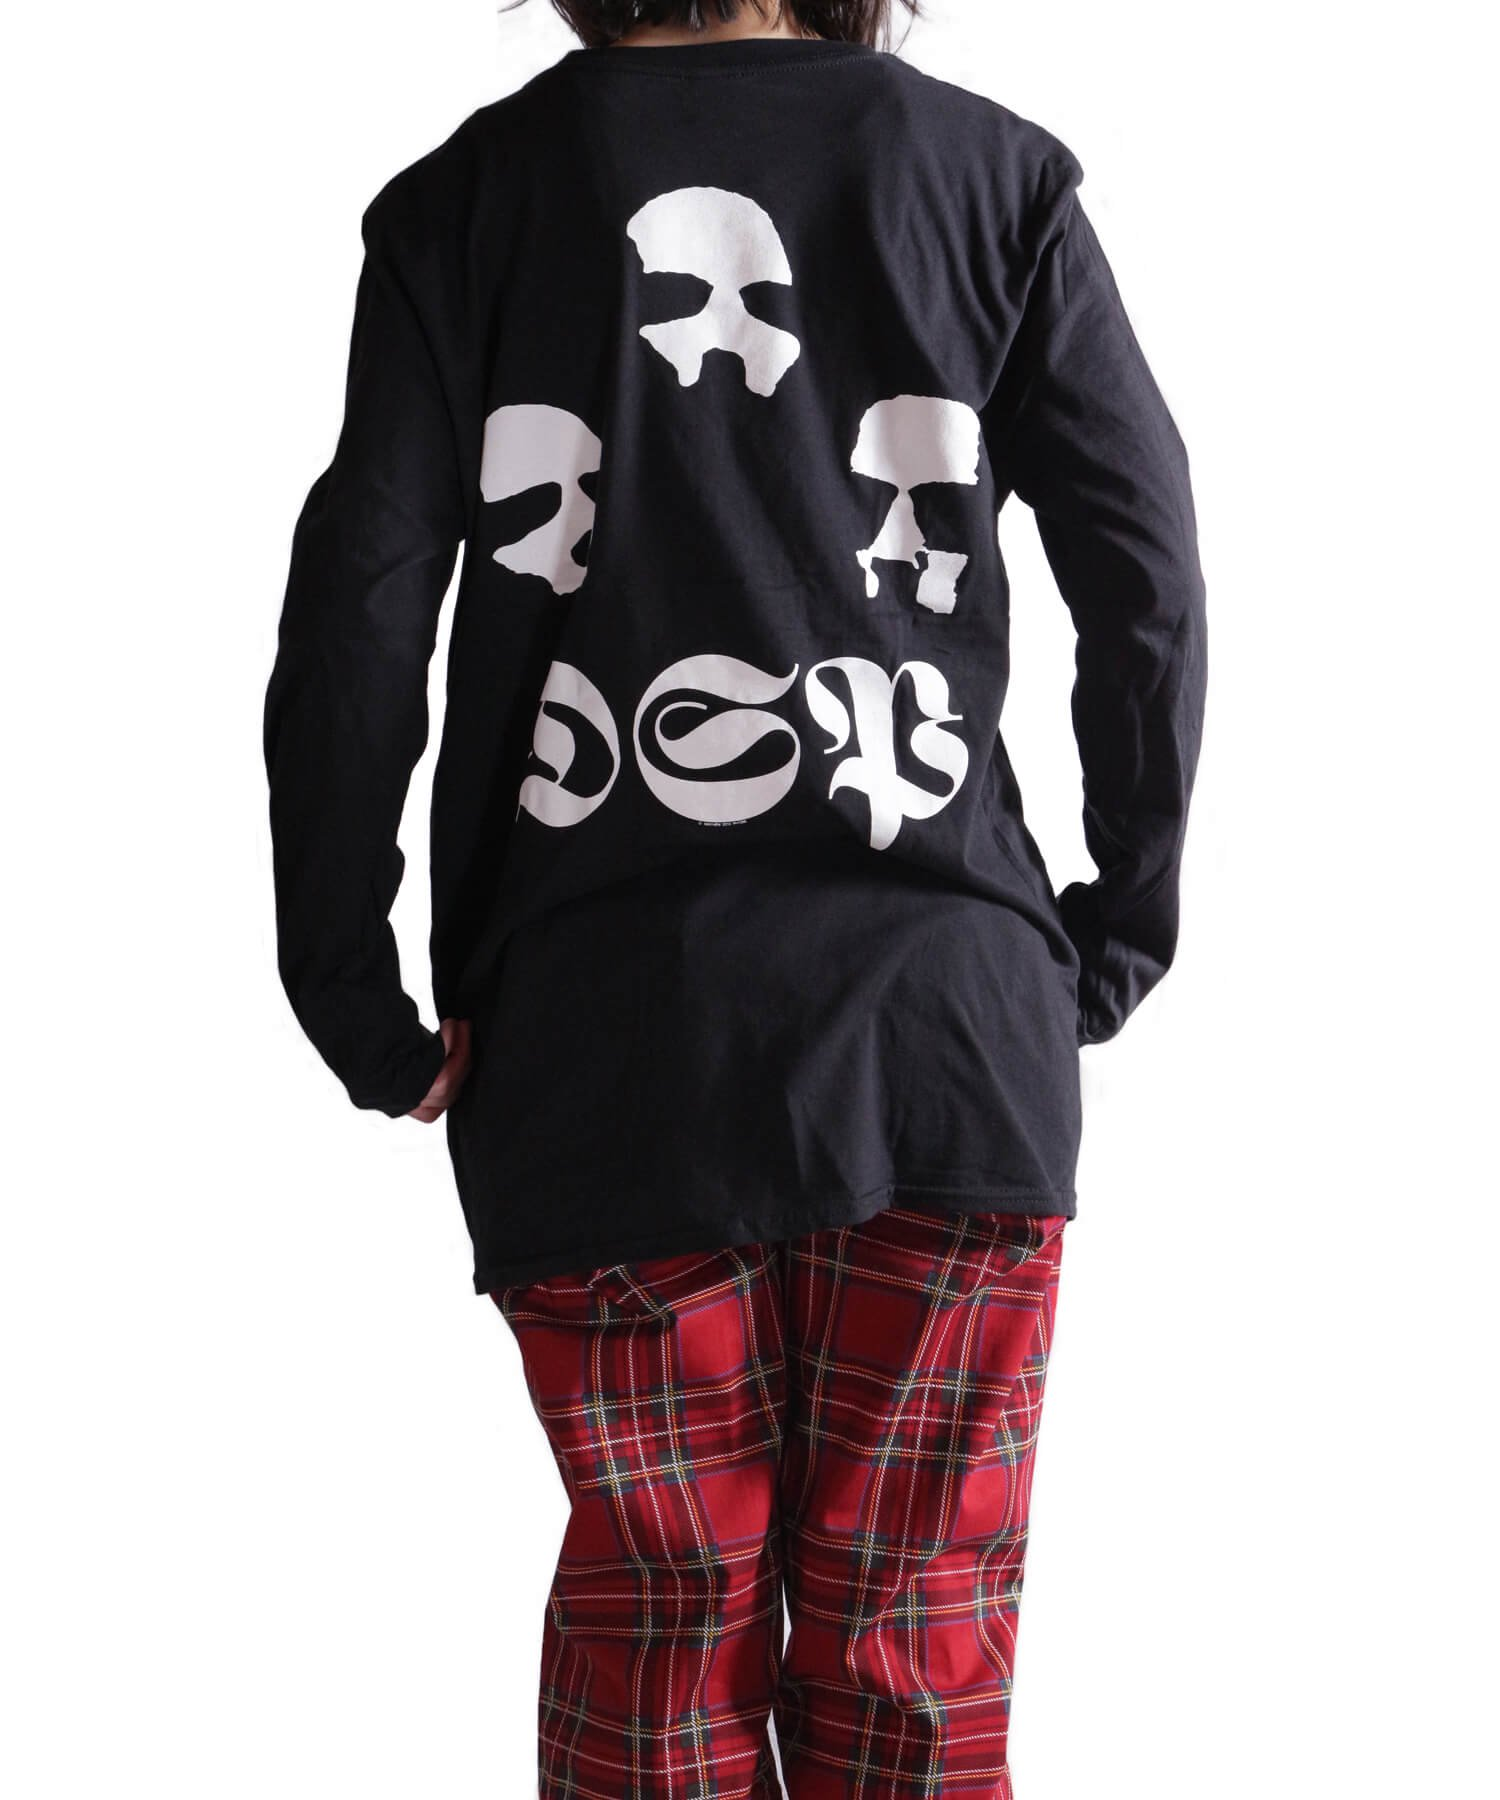 Official Artist Goods / バンドTなど |MAYHEM / メイヘム:DE MYSTERIIS DOM SATHANAS LONG SLEEVE SHIRT (BLACK) 商品画像20